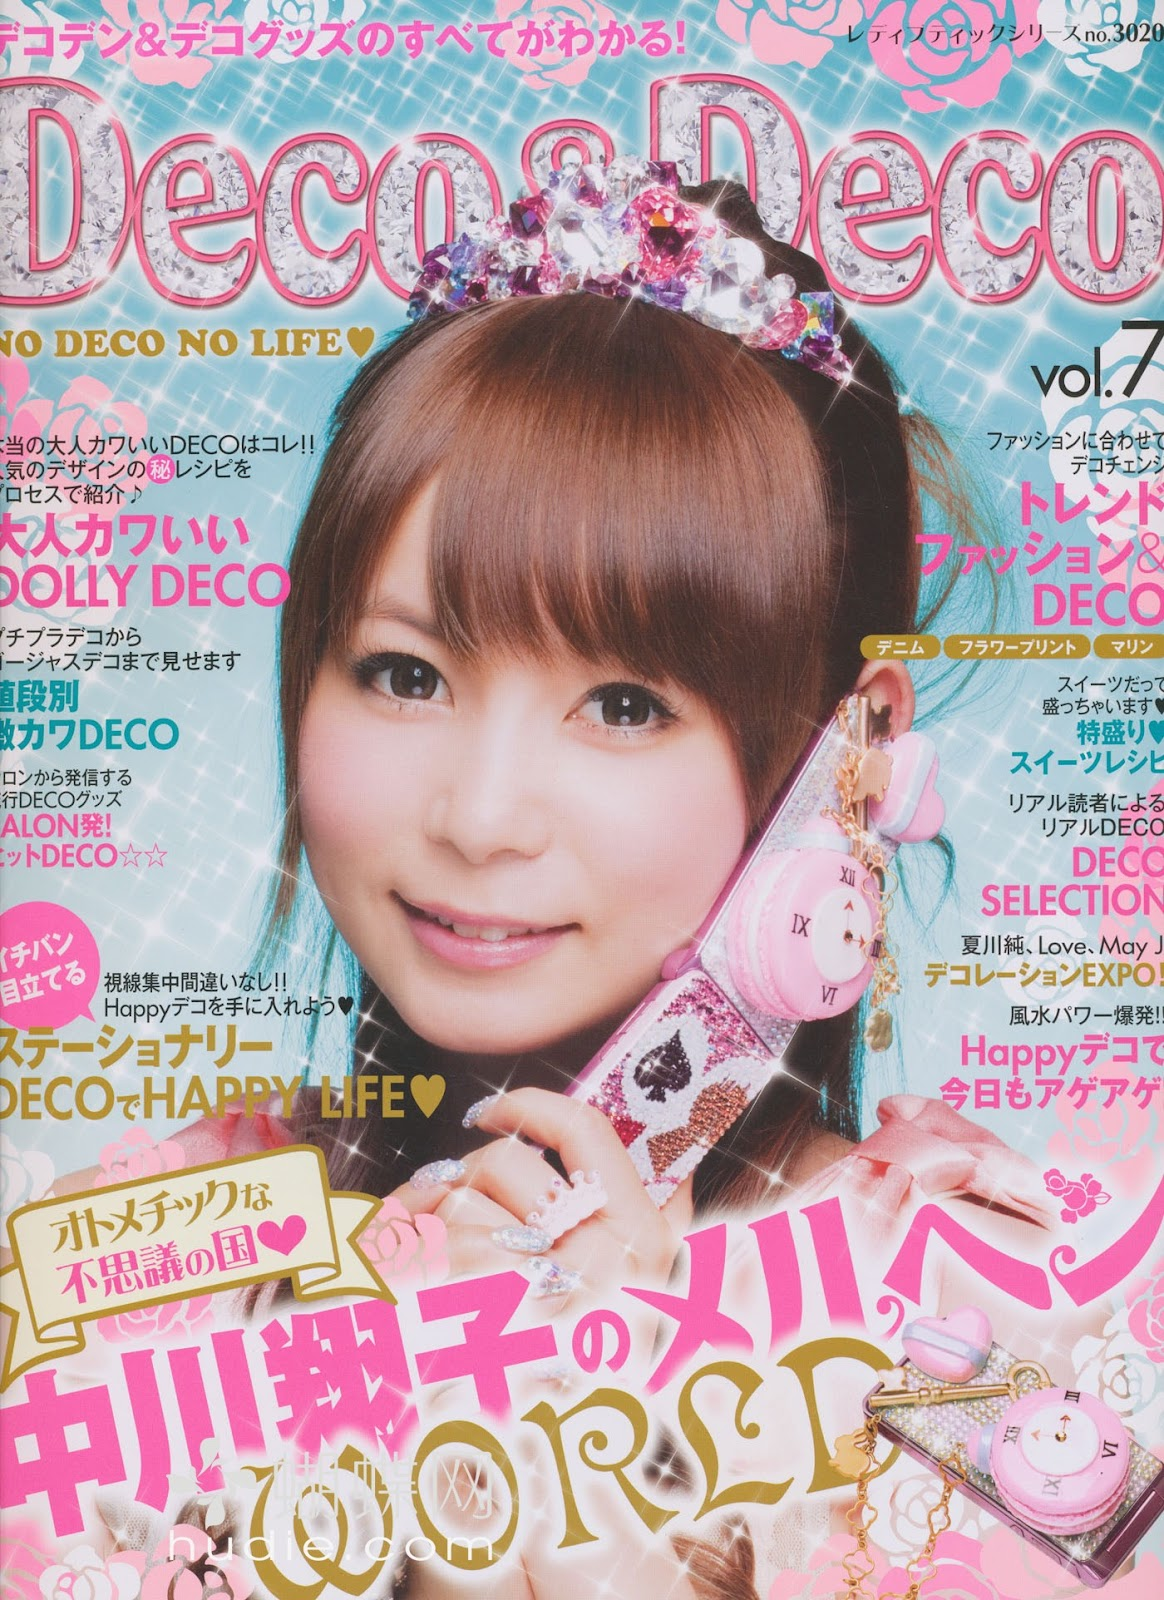 deco deco 2010 volume 7 japanese magazine scans